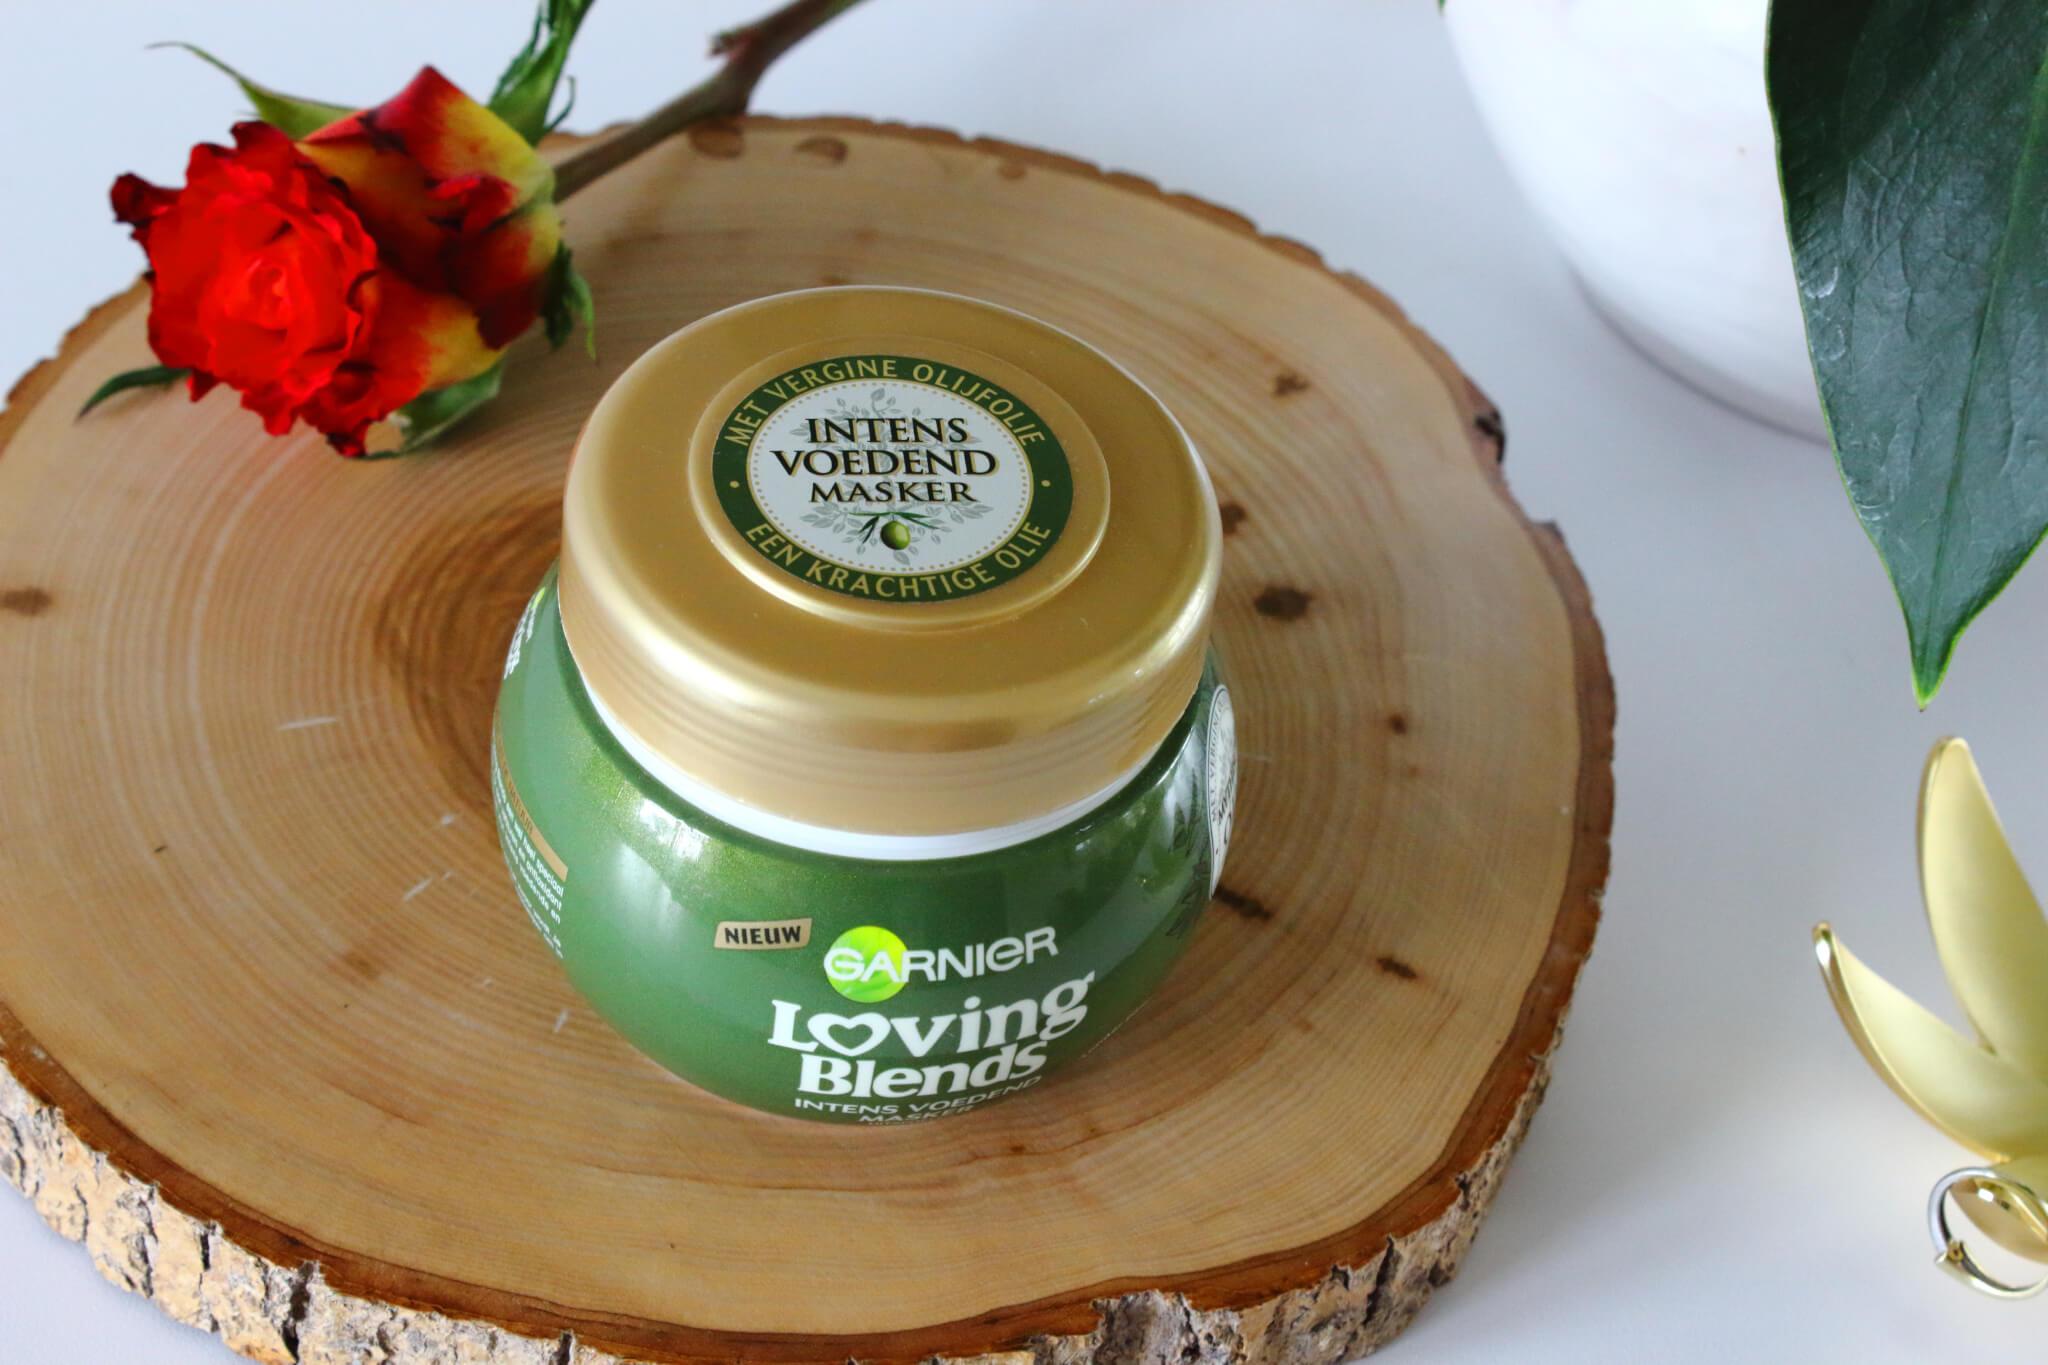 MindandBeauty.nl Review Garnier Loving Blends Intens Voedend Masker 2 Mythische Olijf